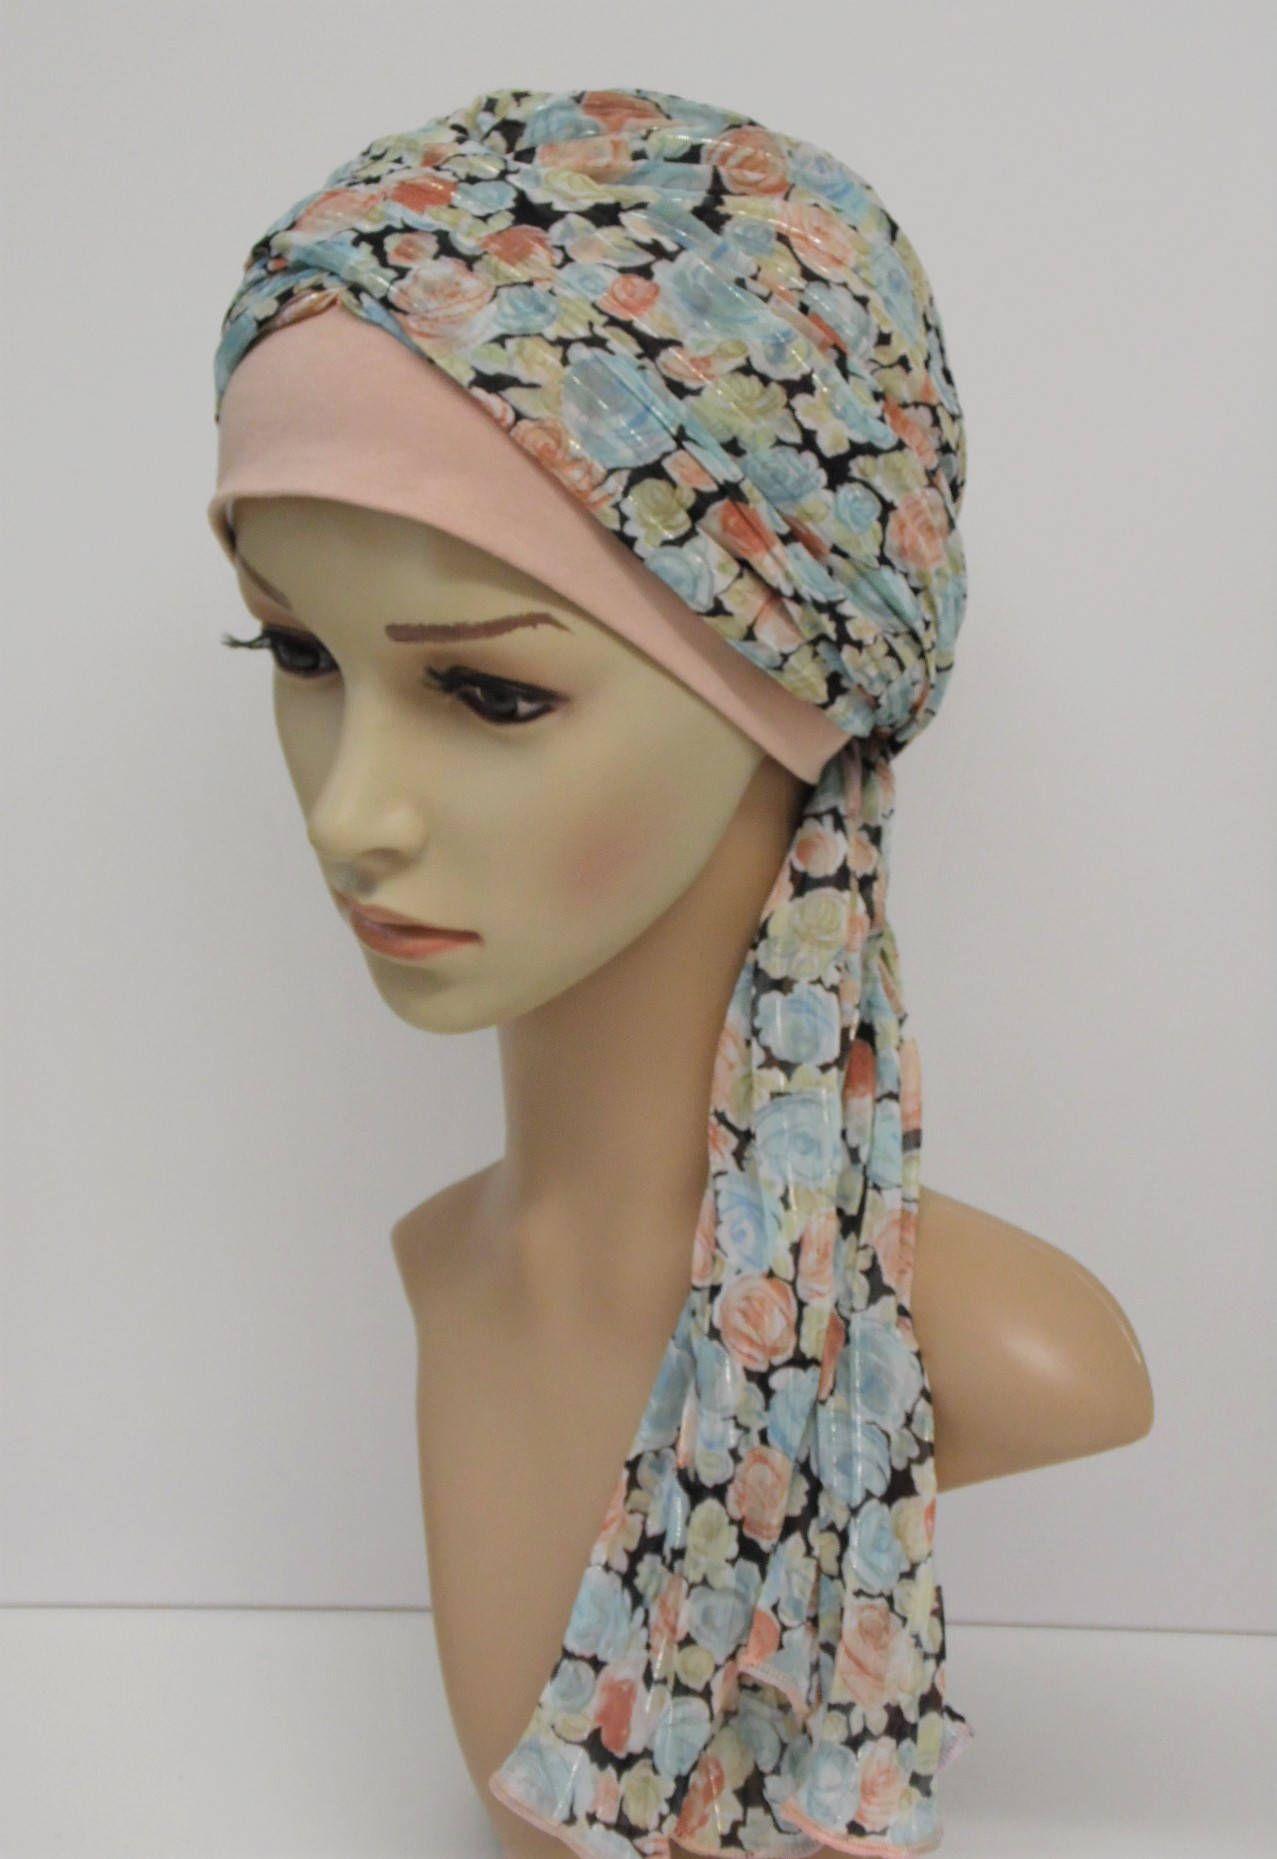 Women head snood head scarf tichel headscarf bonnet with ties hair snood